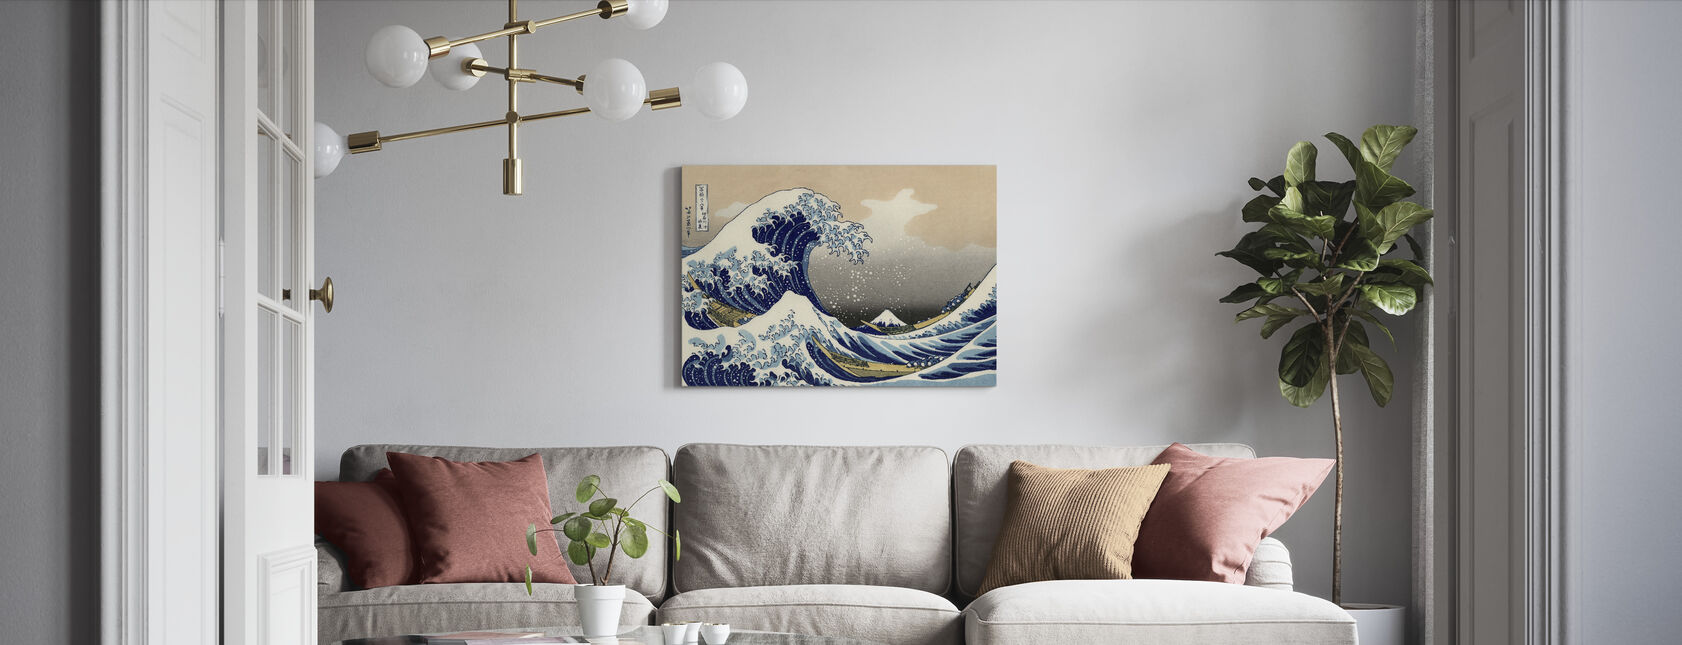 Grote Golf, Katsushika Hokusai - Canvas print - Woonkamer